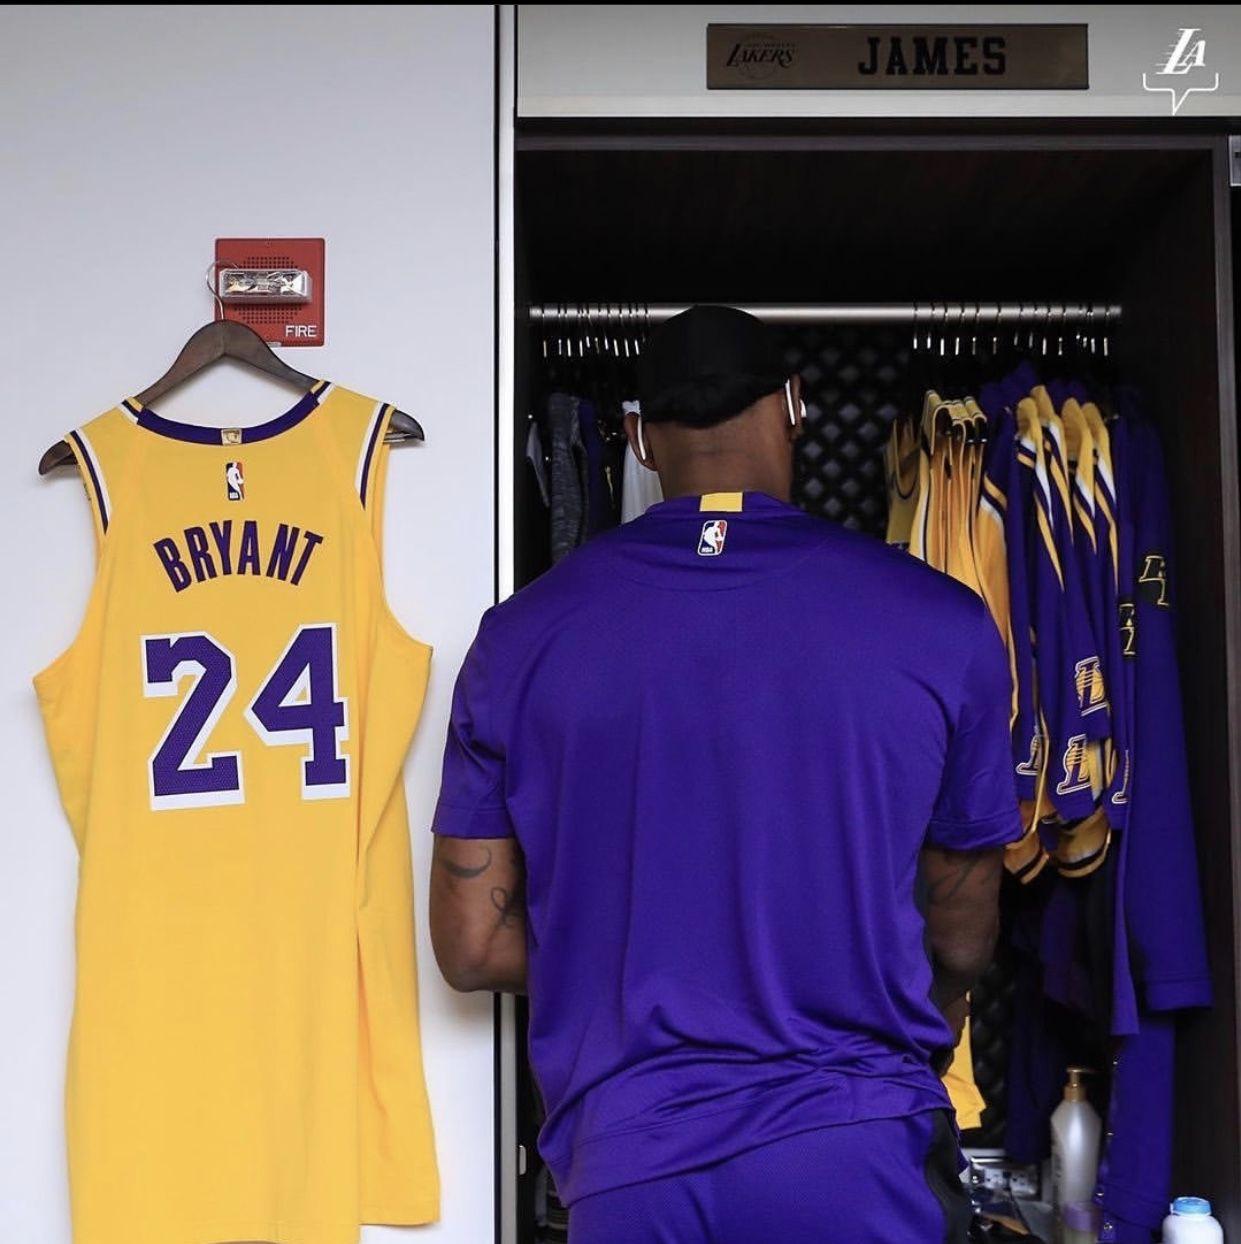 Kobe Jersey Next To Lebrons Lockers Respect In 2020 Lebron James Lakers Kobe Bryant Black Mamba Kobe Bryant